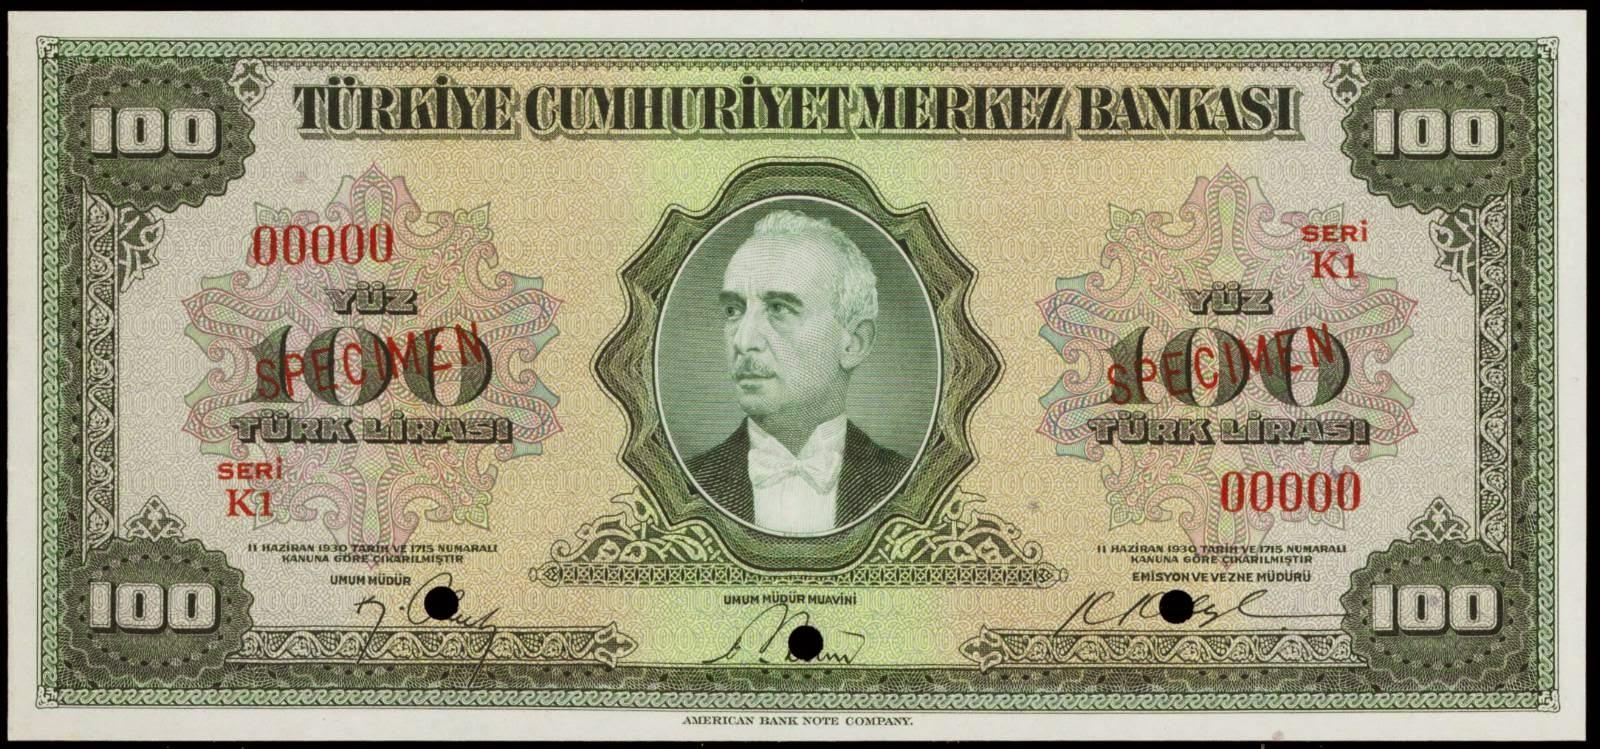 Banknotes of Turkey 100 Turkish Lira banknote 1947 İsmet İnönü 1930